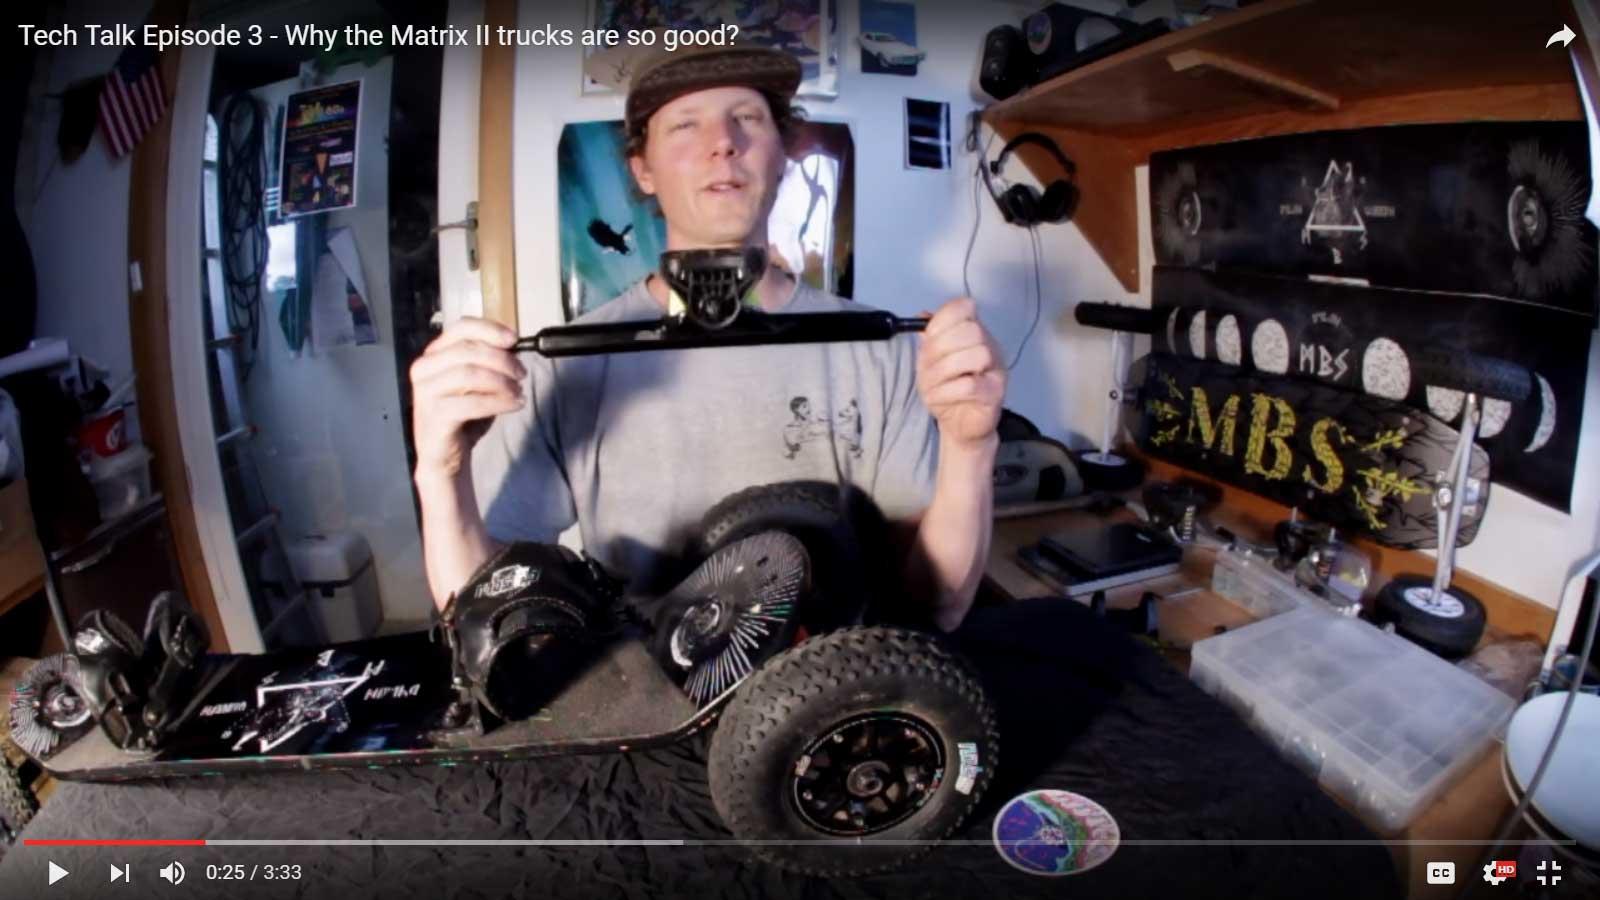 MBS Tech Talk Episode 3 – Why the Matrix II trucks are so good